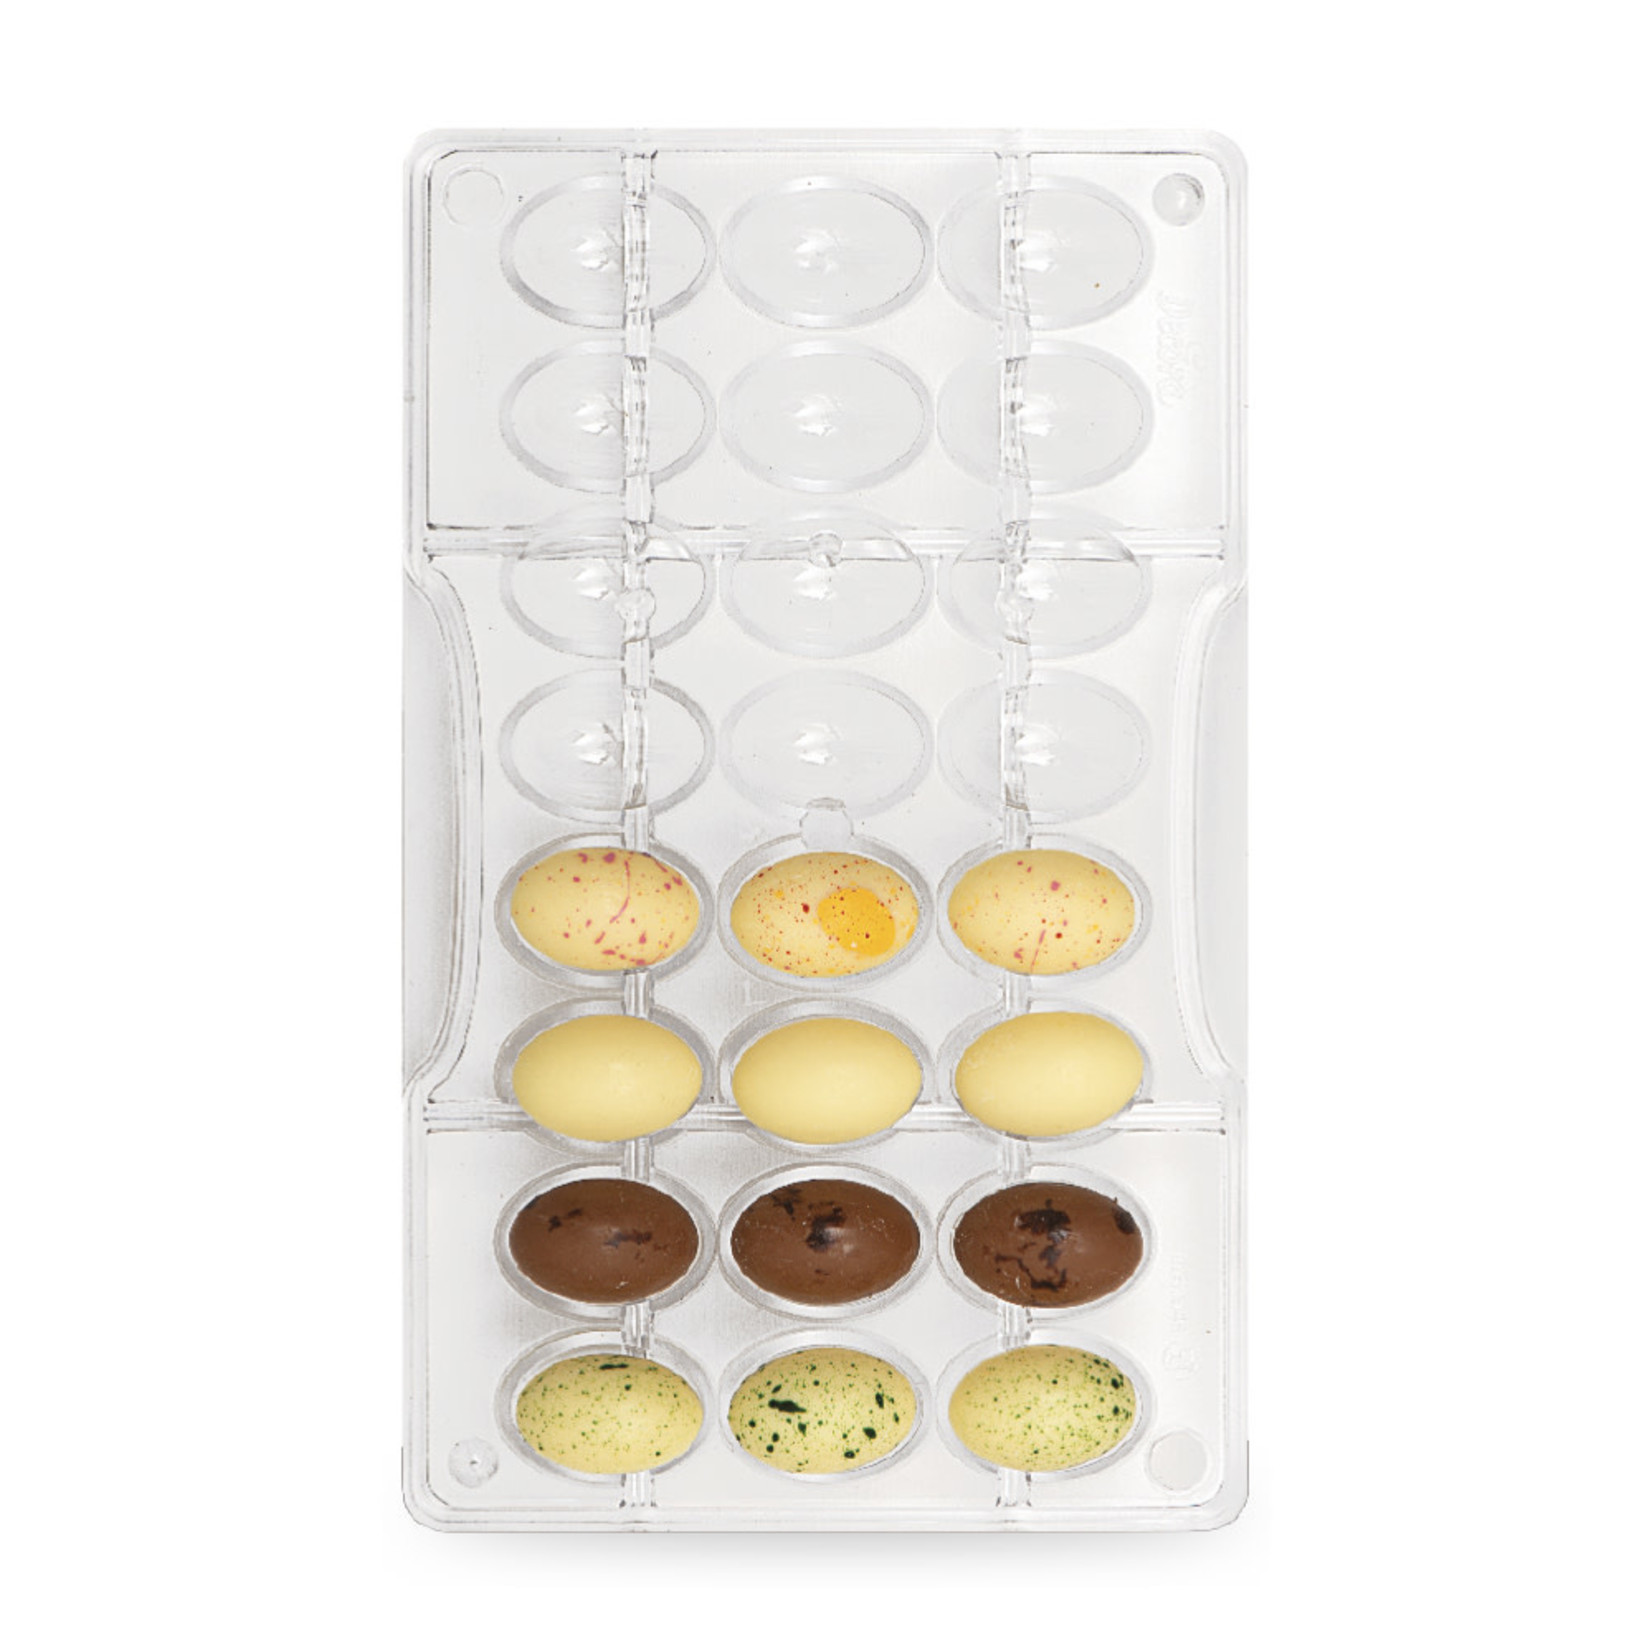 Decora Chocoladevorm polycarbonaat eitjes